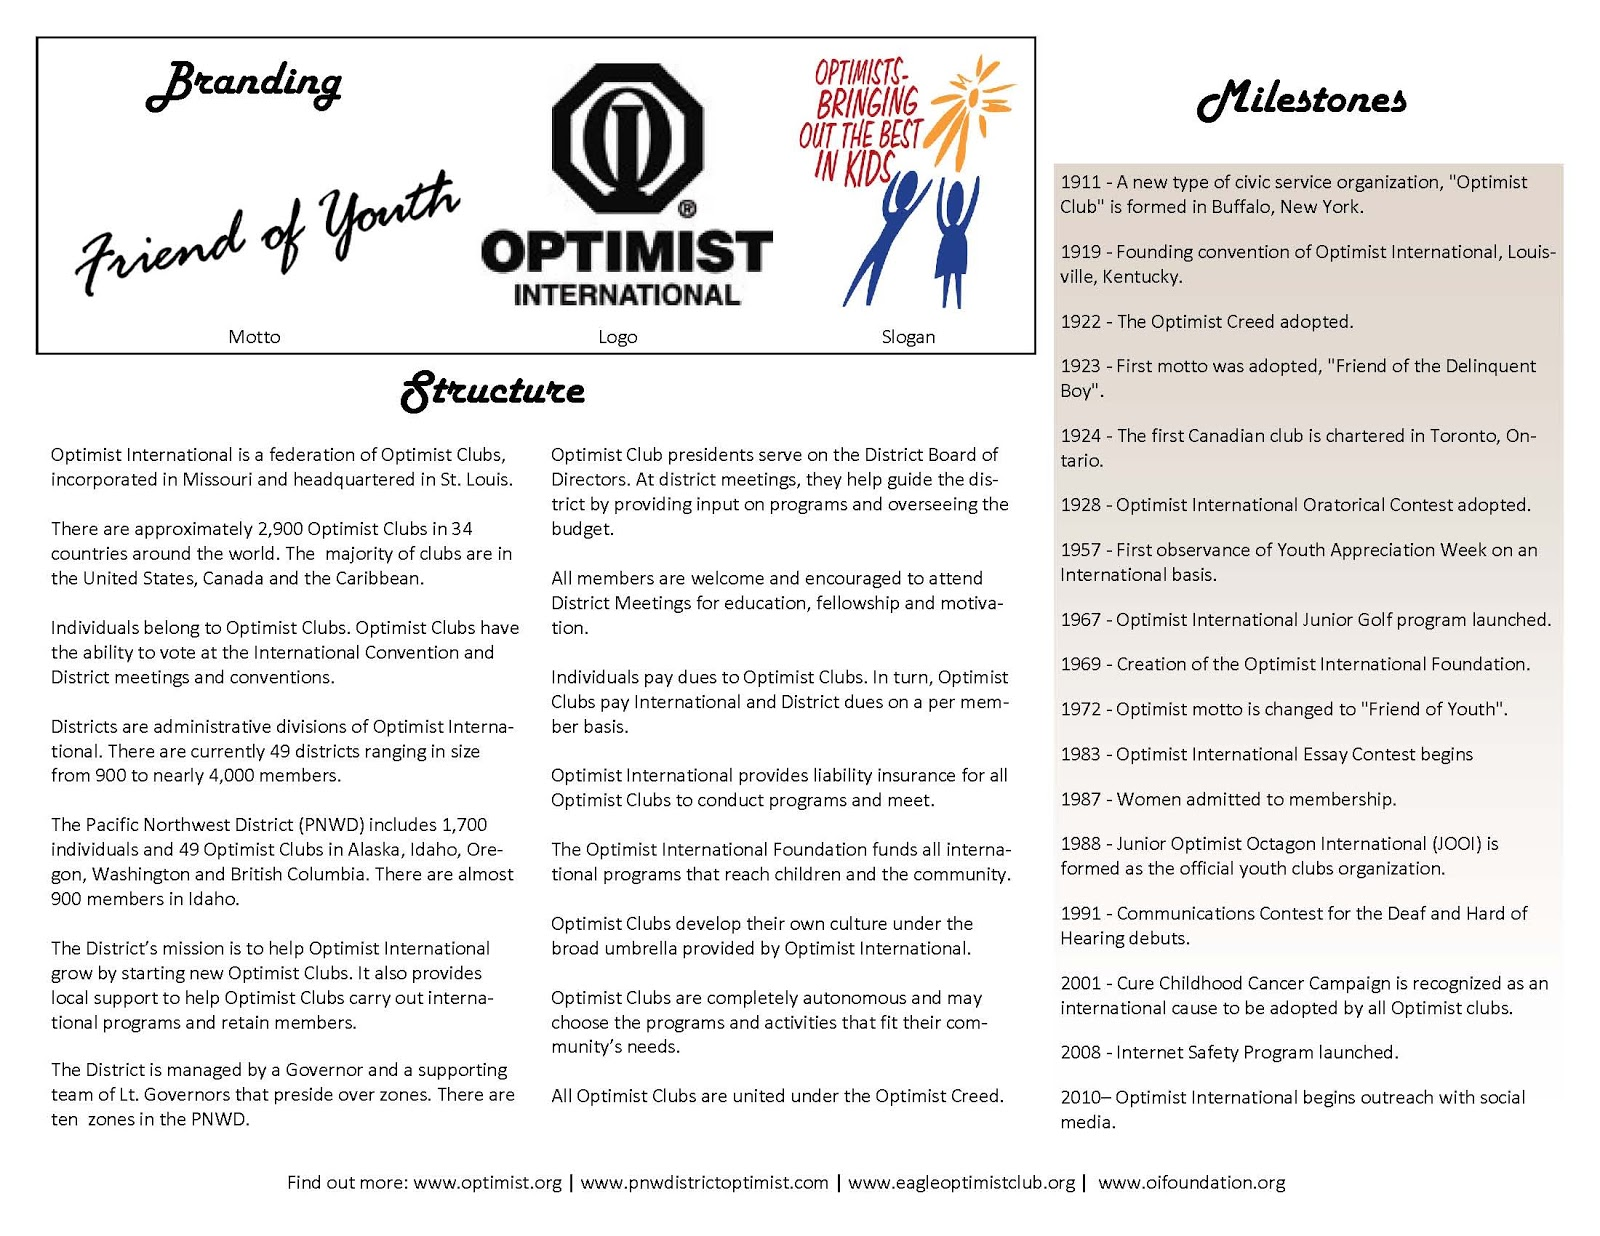 020 Essay Example Orientation Optimist International Wondrous Contest Oratorical Winners Rules Full